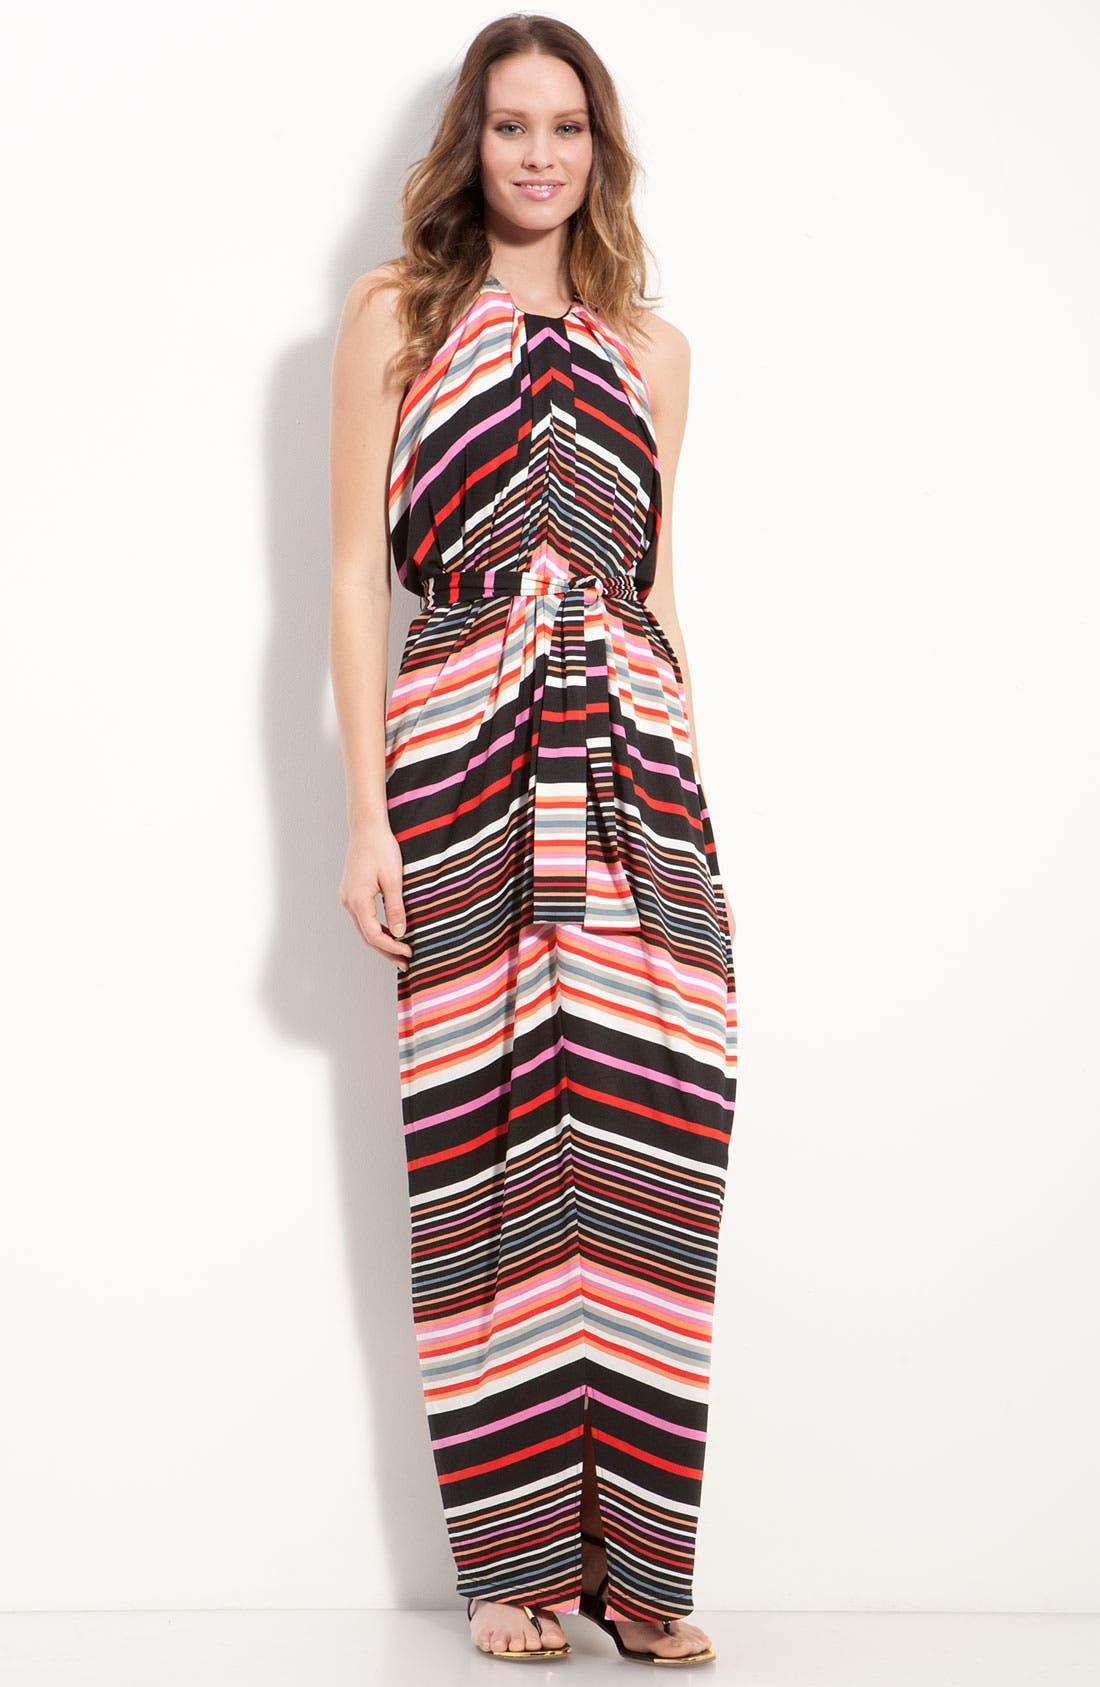 Main Image - Suzi Chin for Maggy Boutique Stripe Jersey Halter Dress